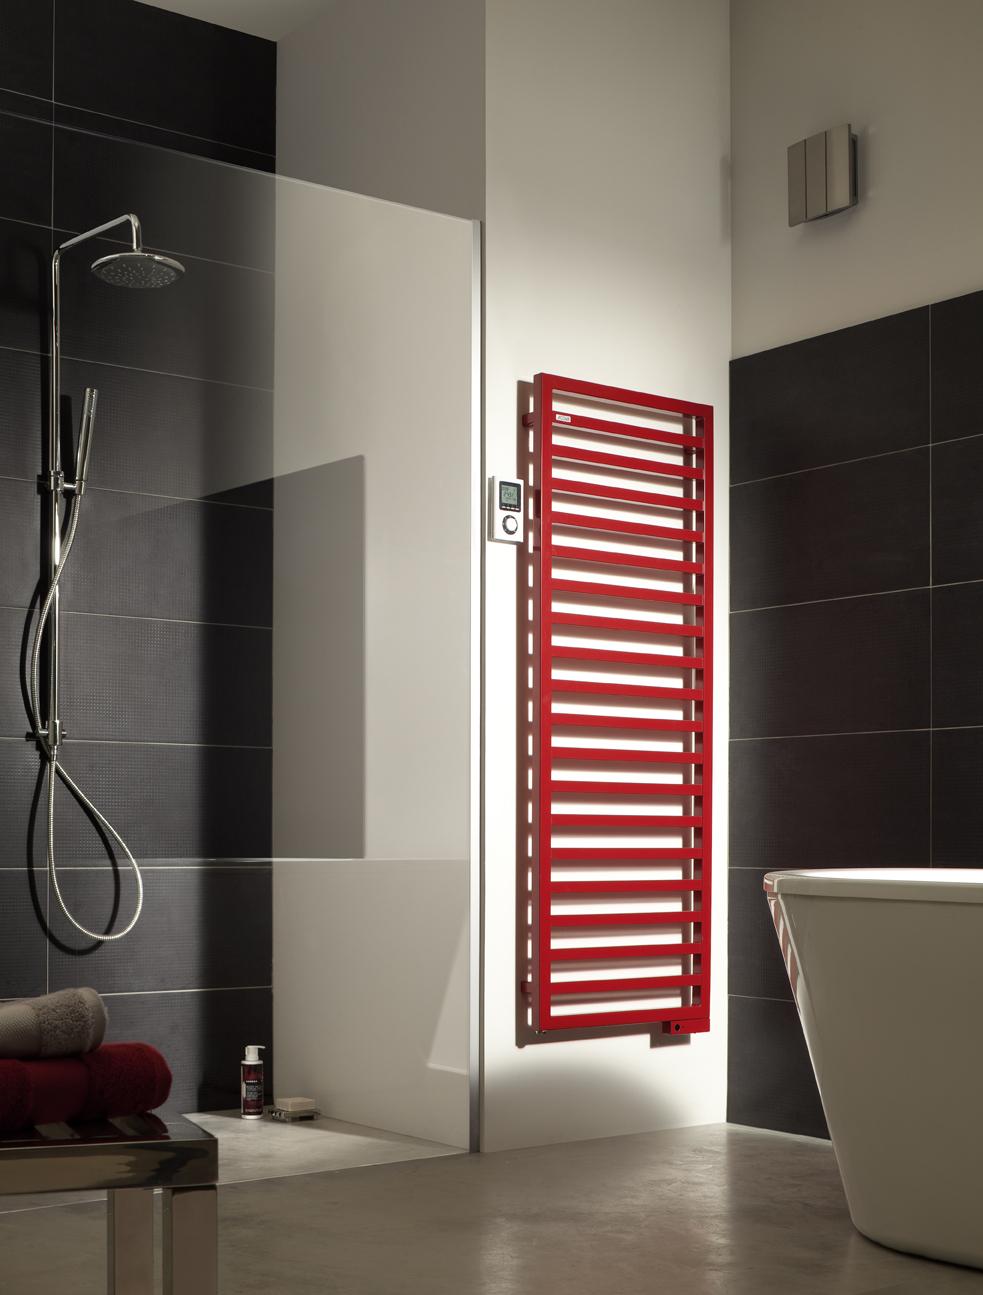 acova ckarena spa 750w couleurs vertical 50x175cm. Black Bedroom Furniture Sets. Home Design Ideas